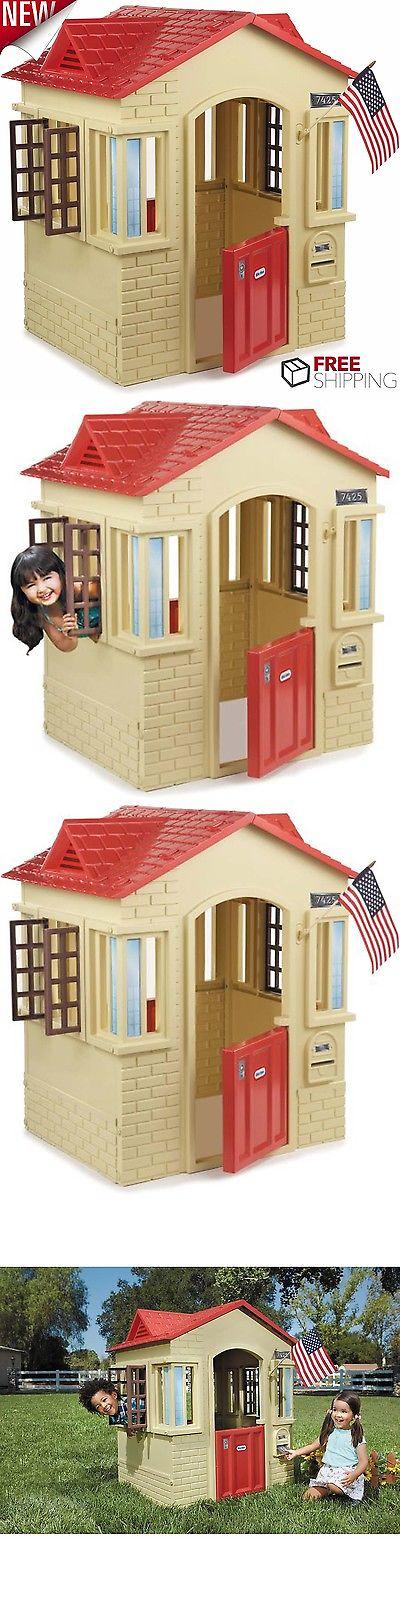 Permanent Playhouses 145995 Plastic Playhouse Kids Cottage Children